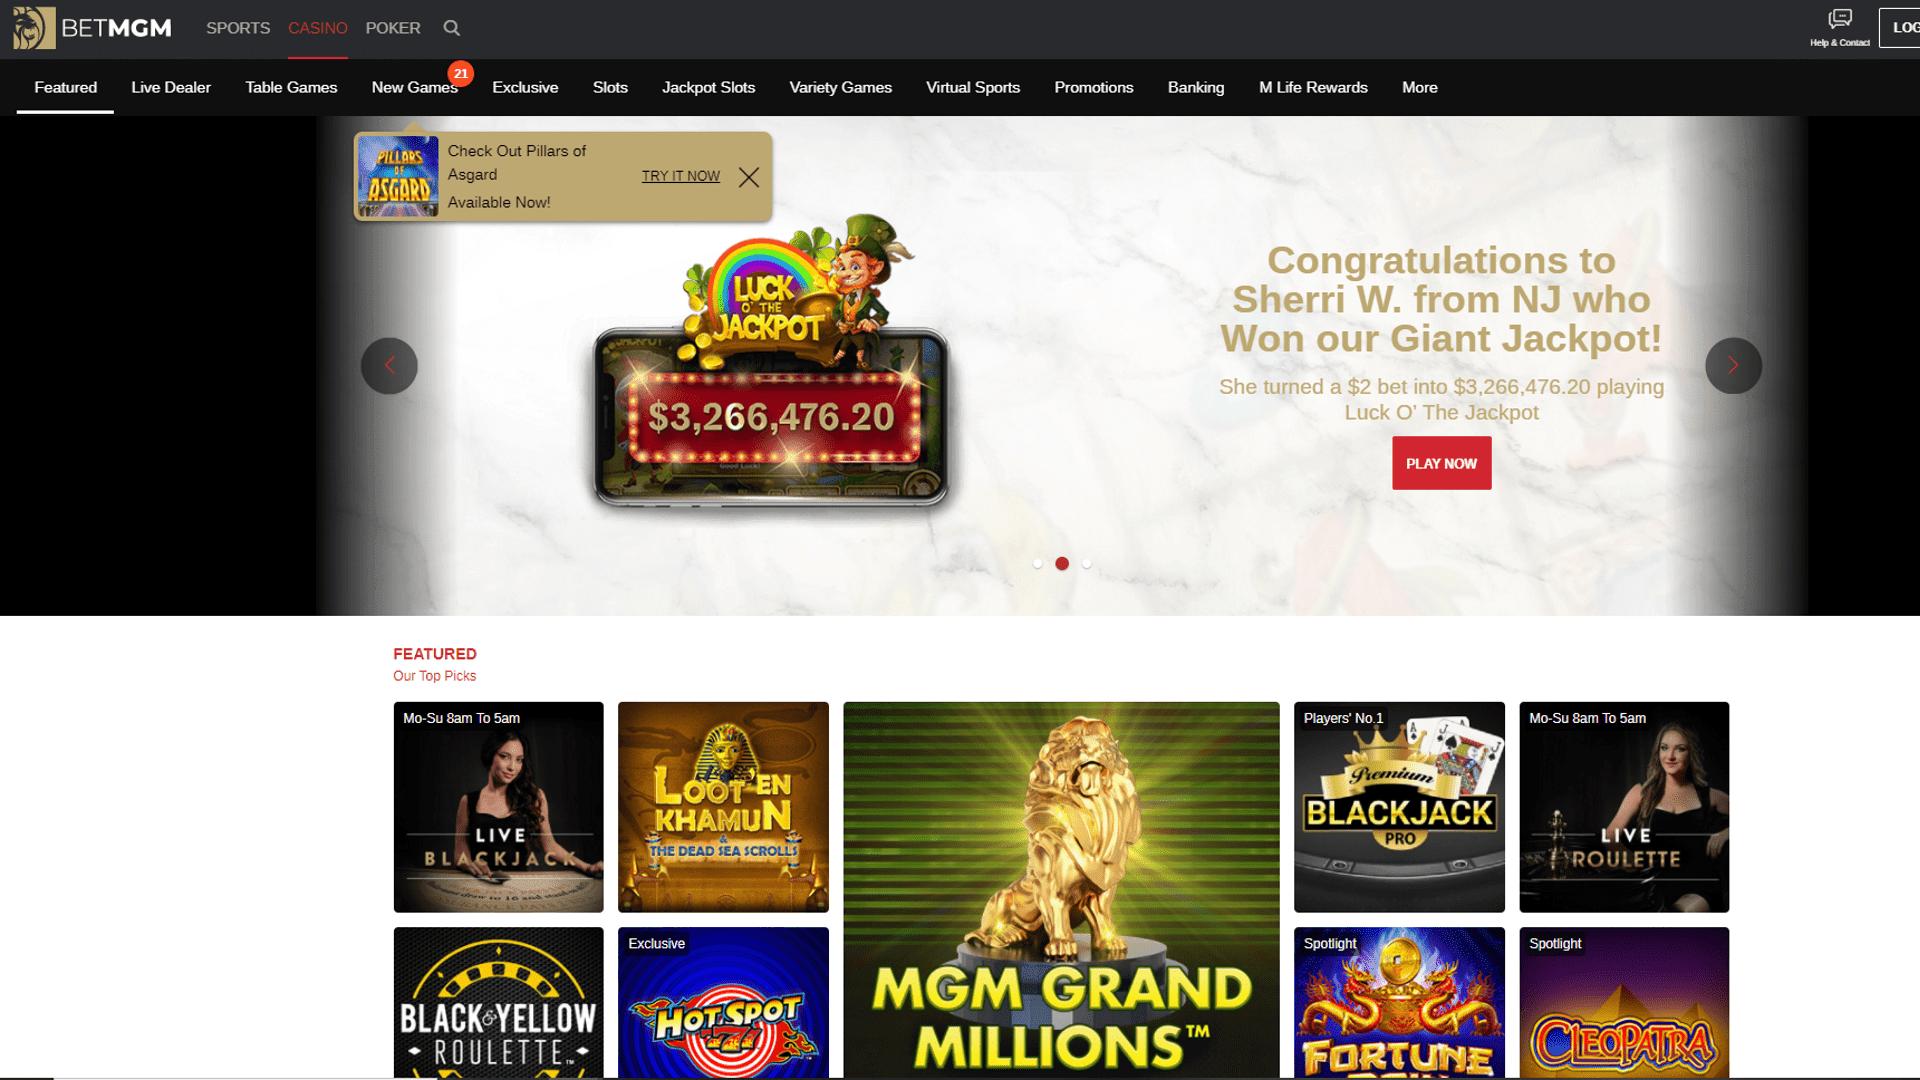 Casino cruise no deposit bonus codes рџЏ† & free spins yummyspins